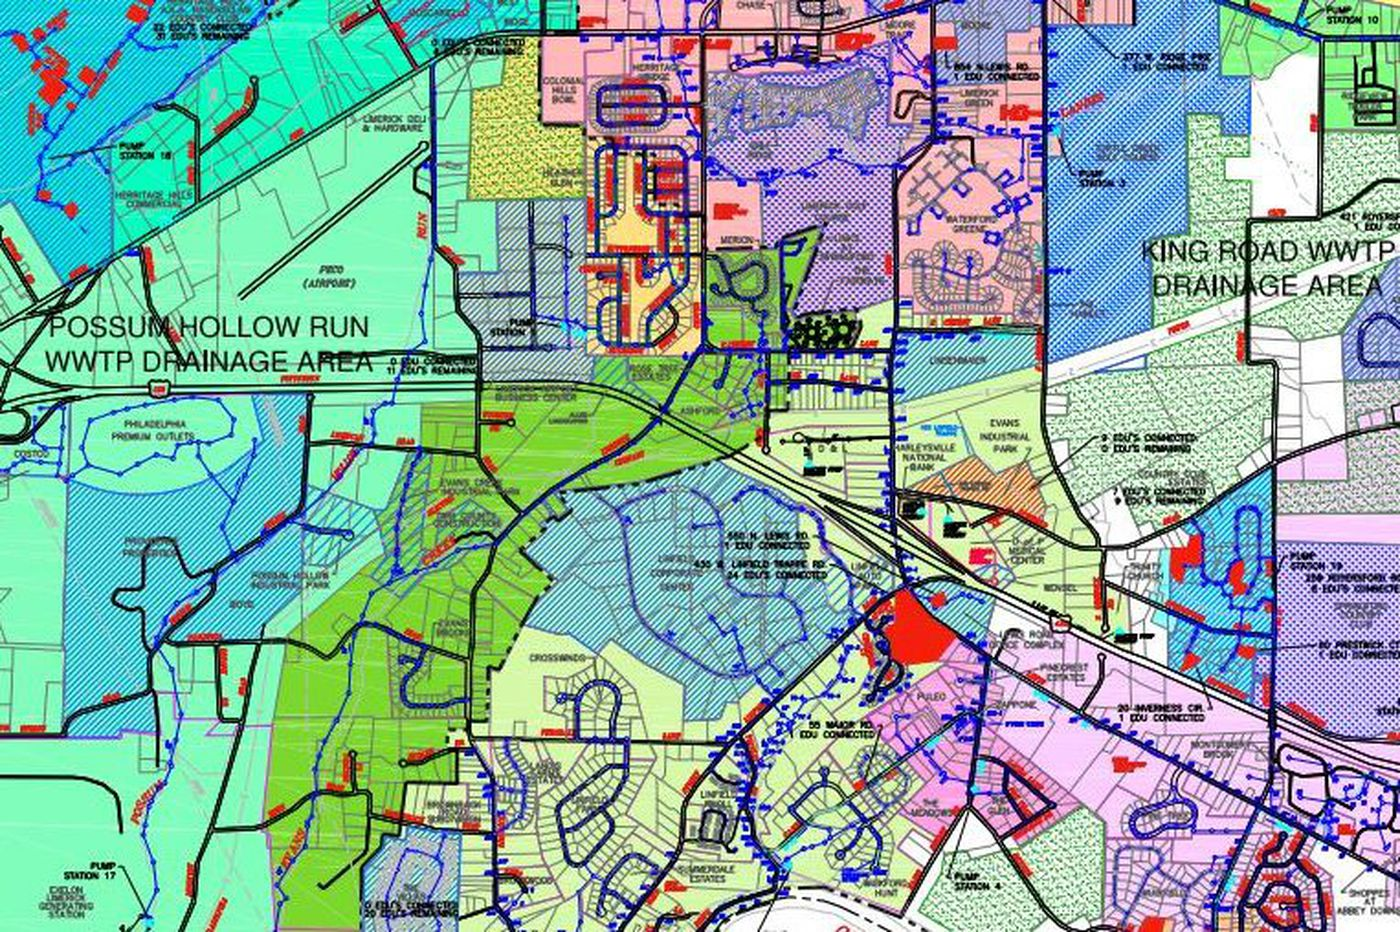 Consumer advocate questions public benefit of Aqua's $75M sewer system acquisition